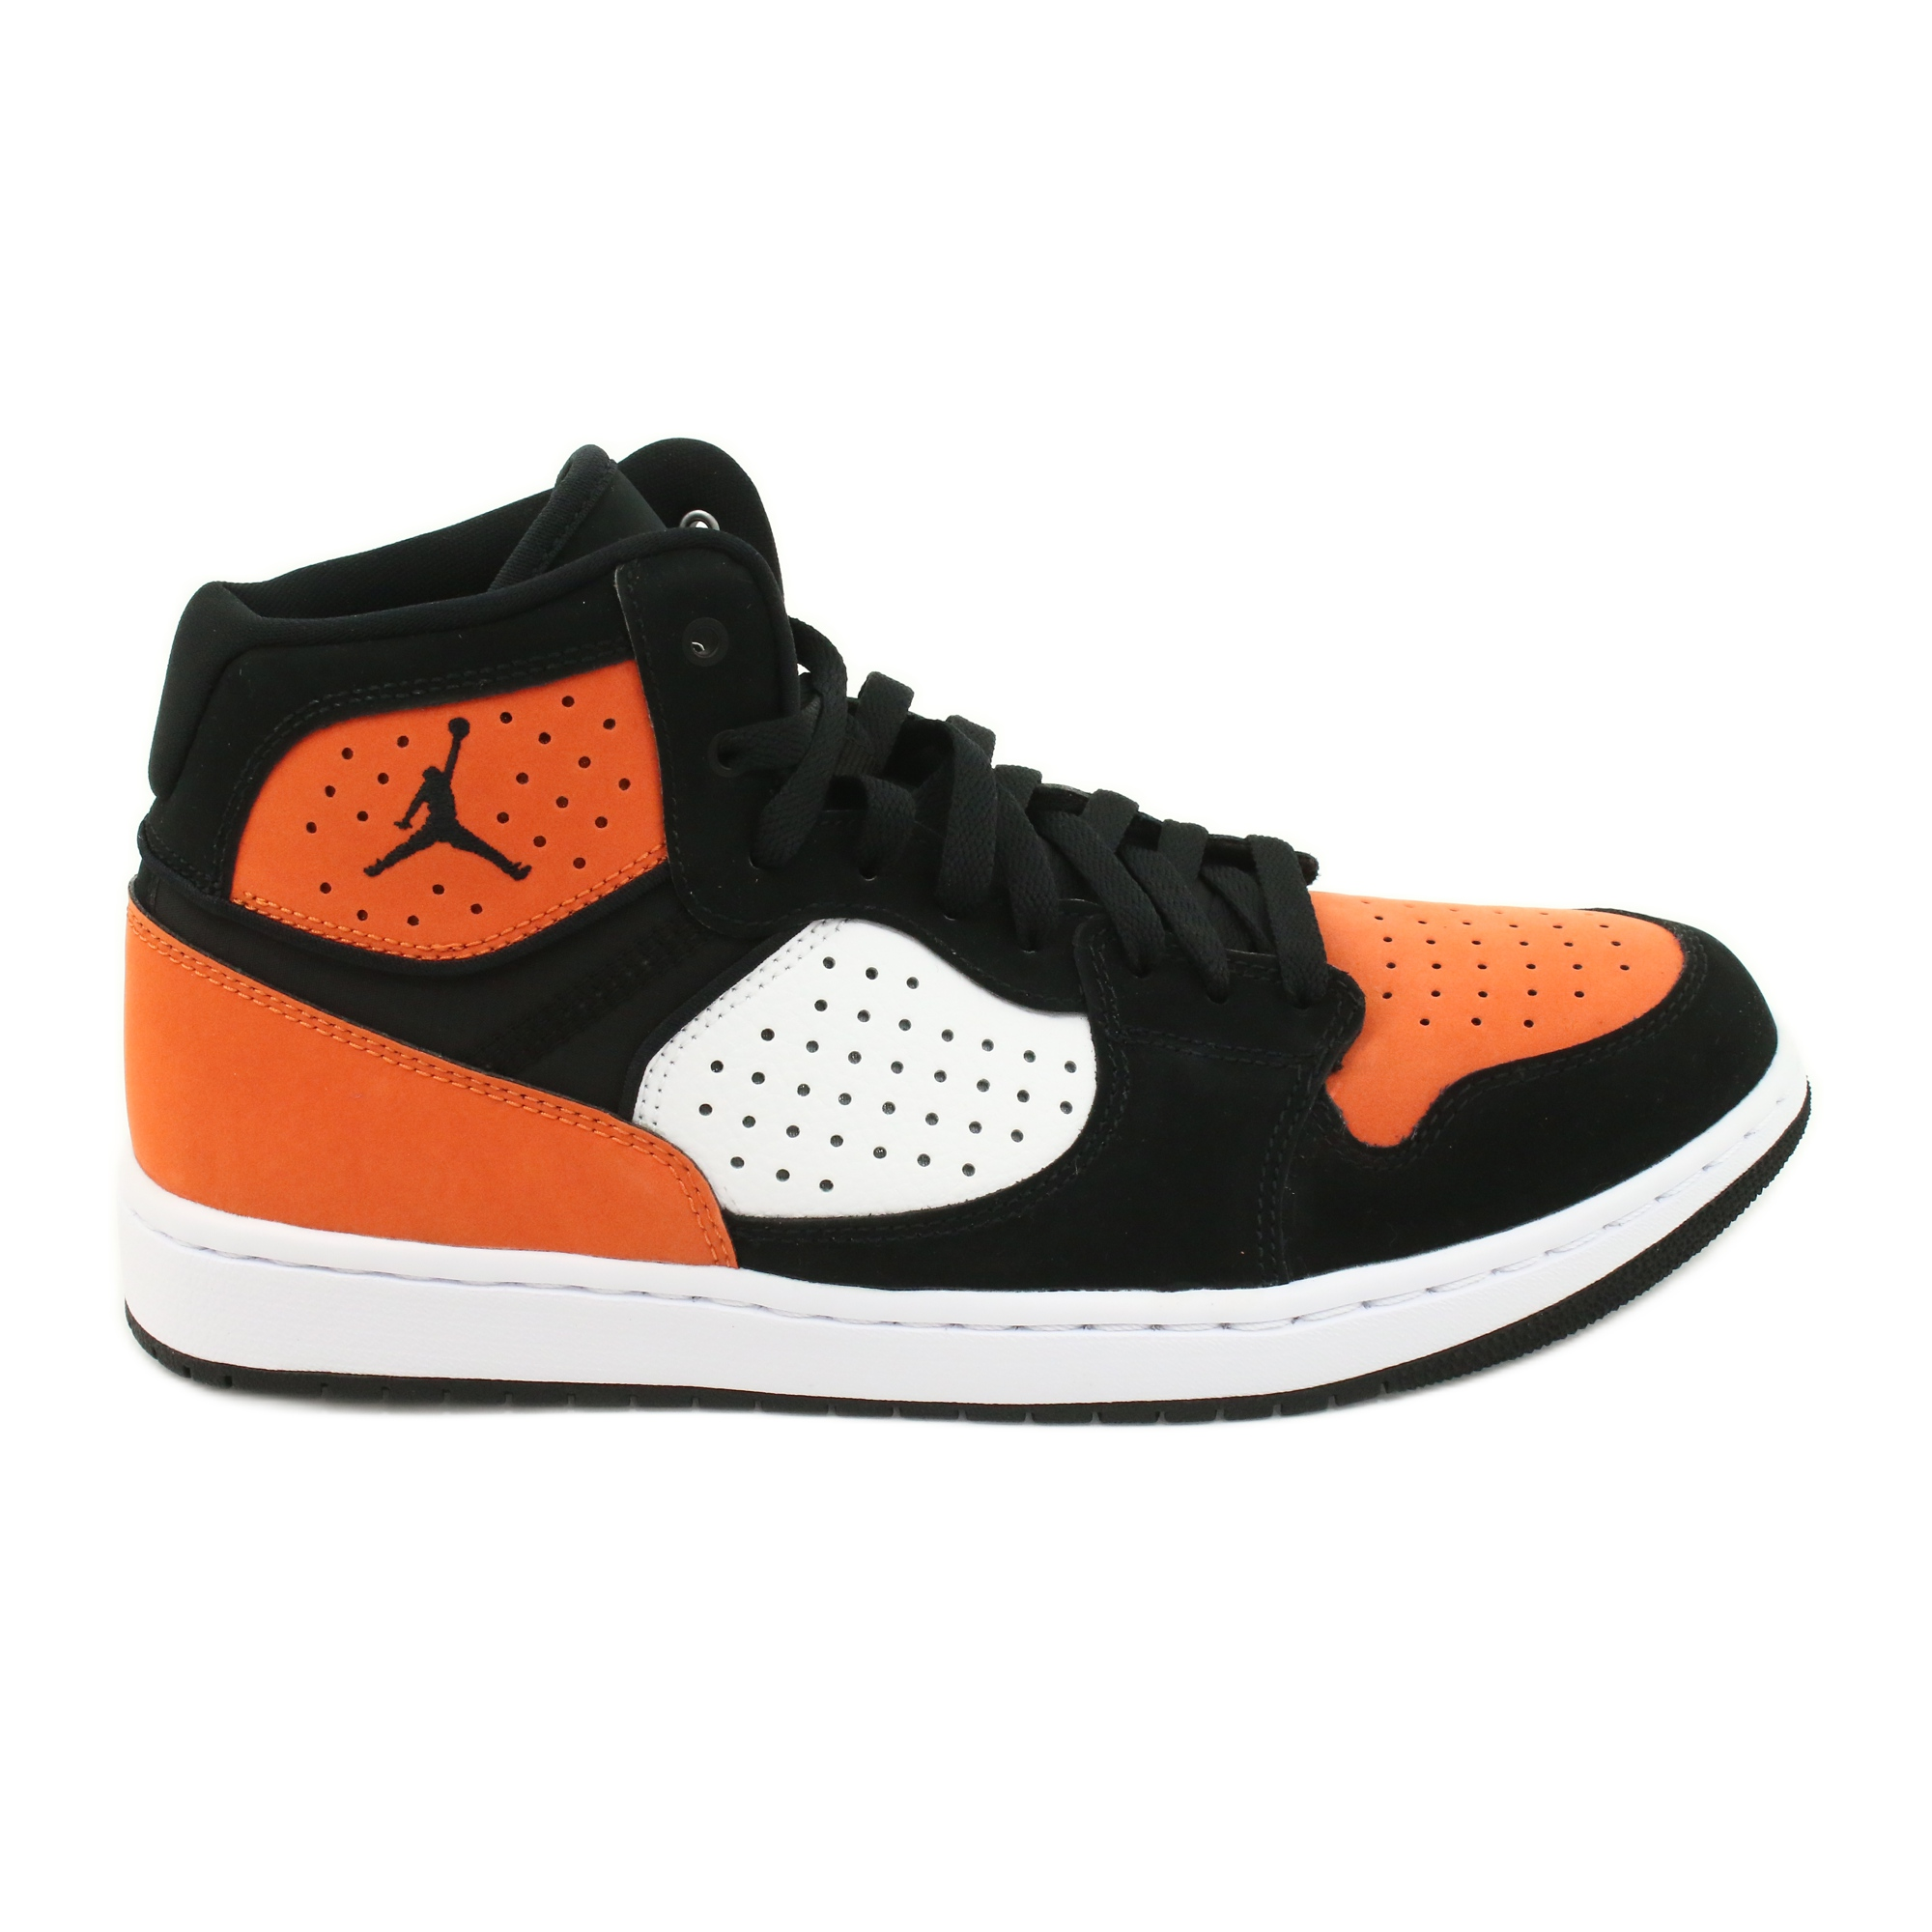 Nike Jordan Jordan Access M AR3762-008 shoes orange multicolored